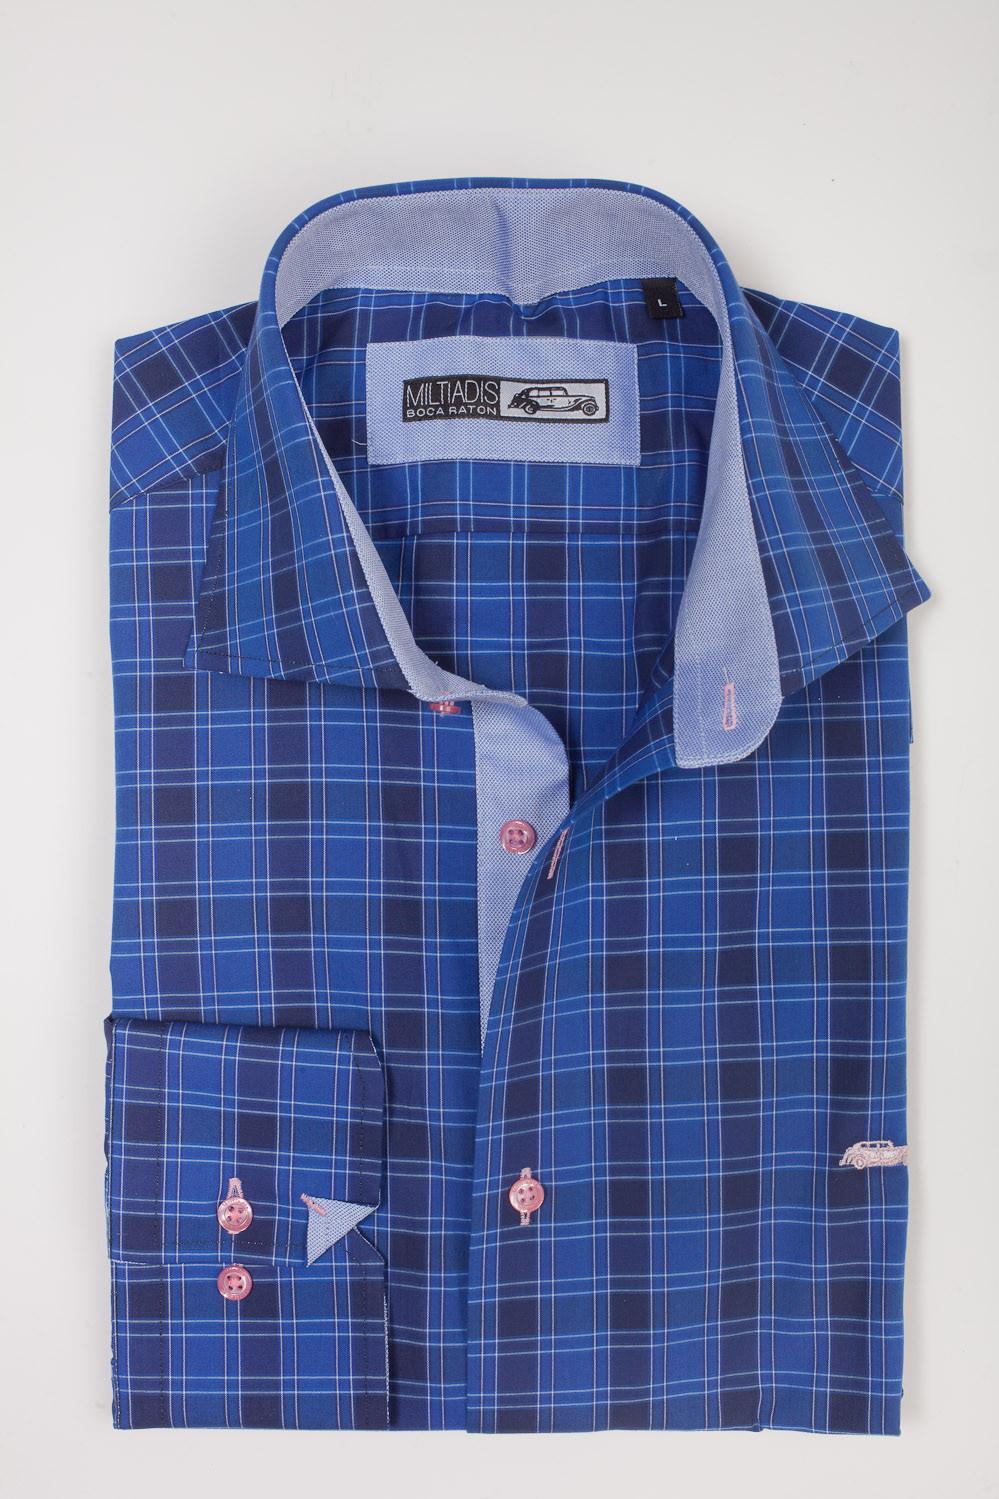 Men's Dress Shirts | Black & Blue Checkered Shirt with Light Pink | Miltiadis XIII 09